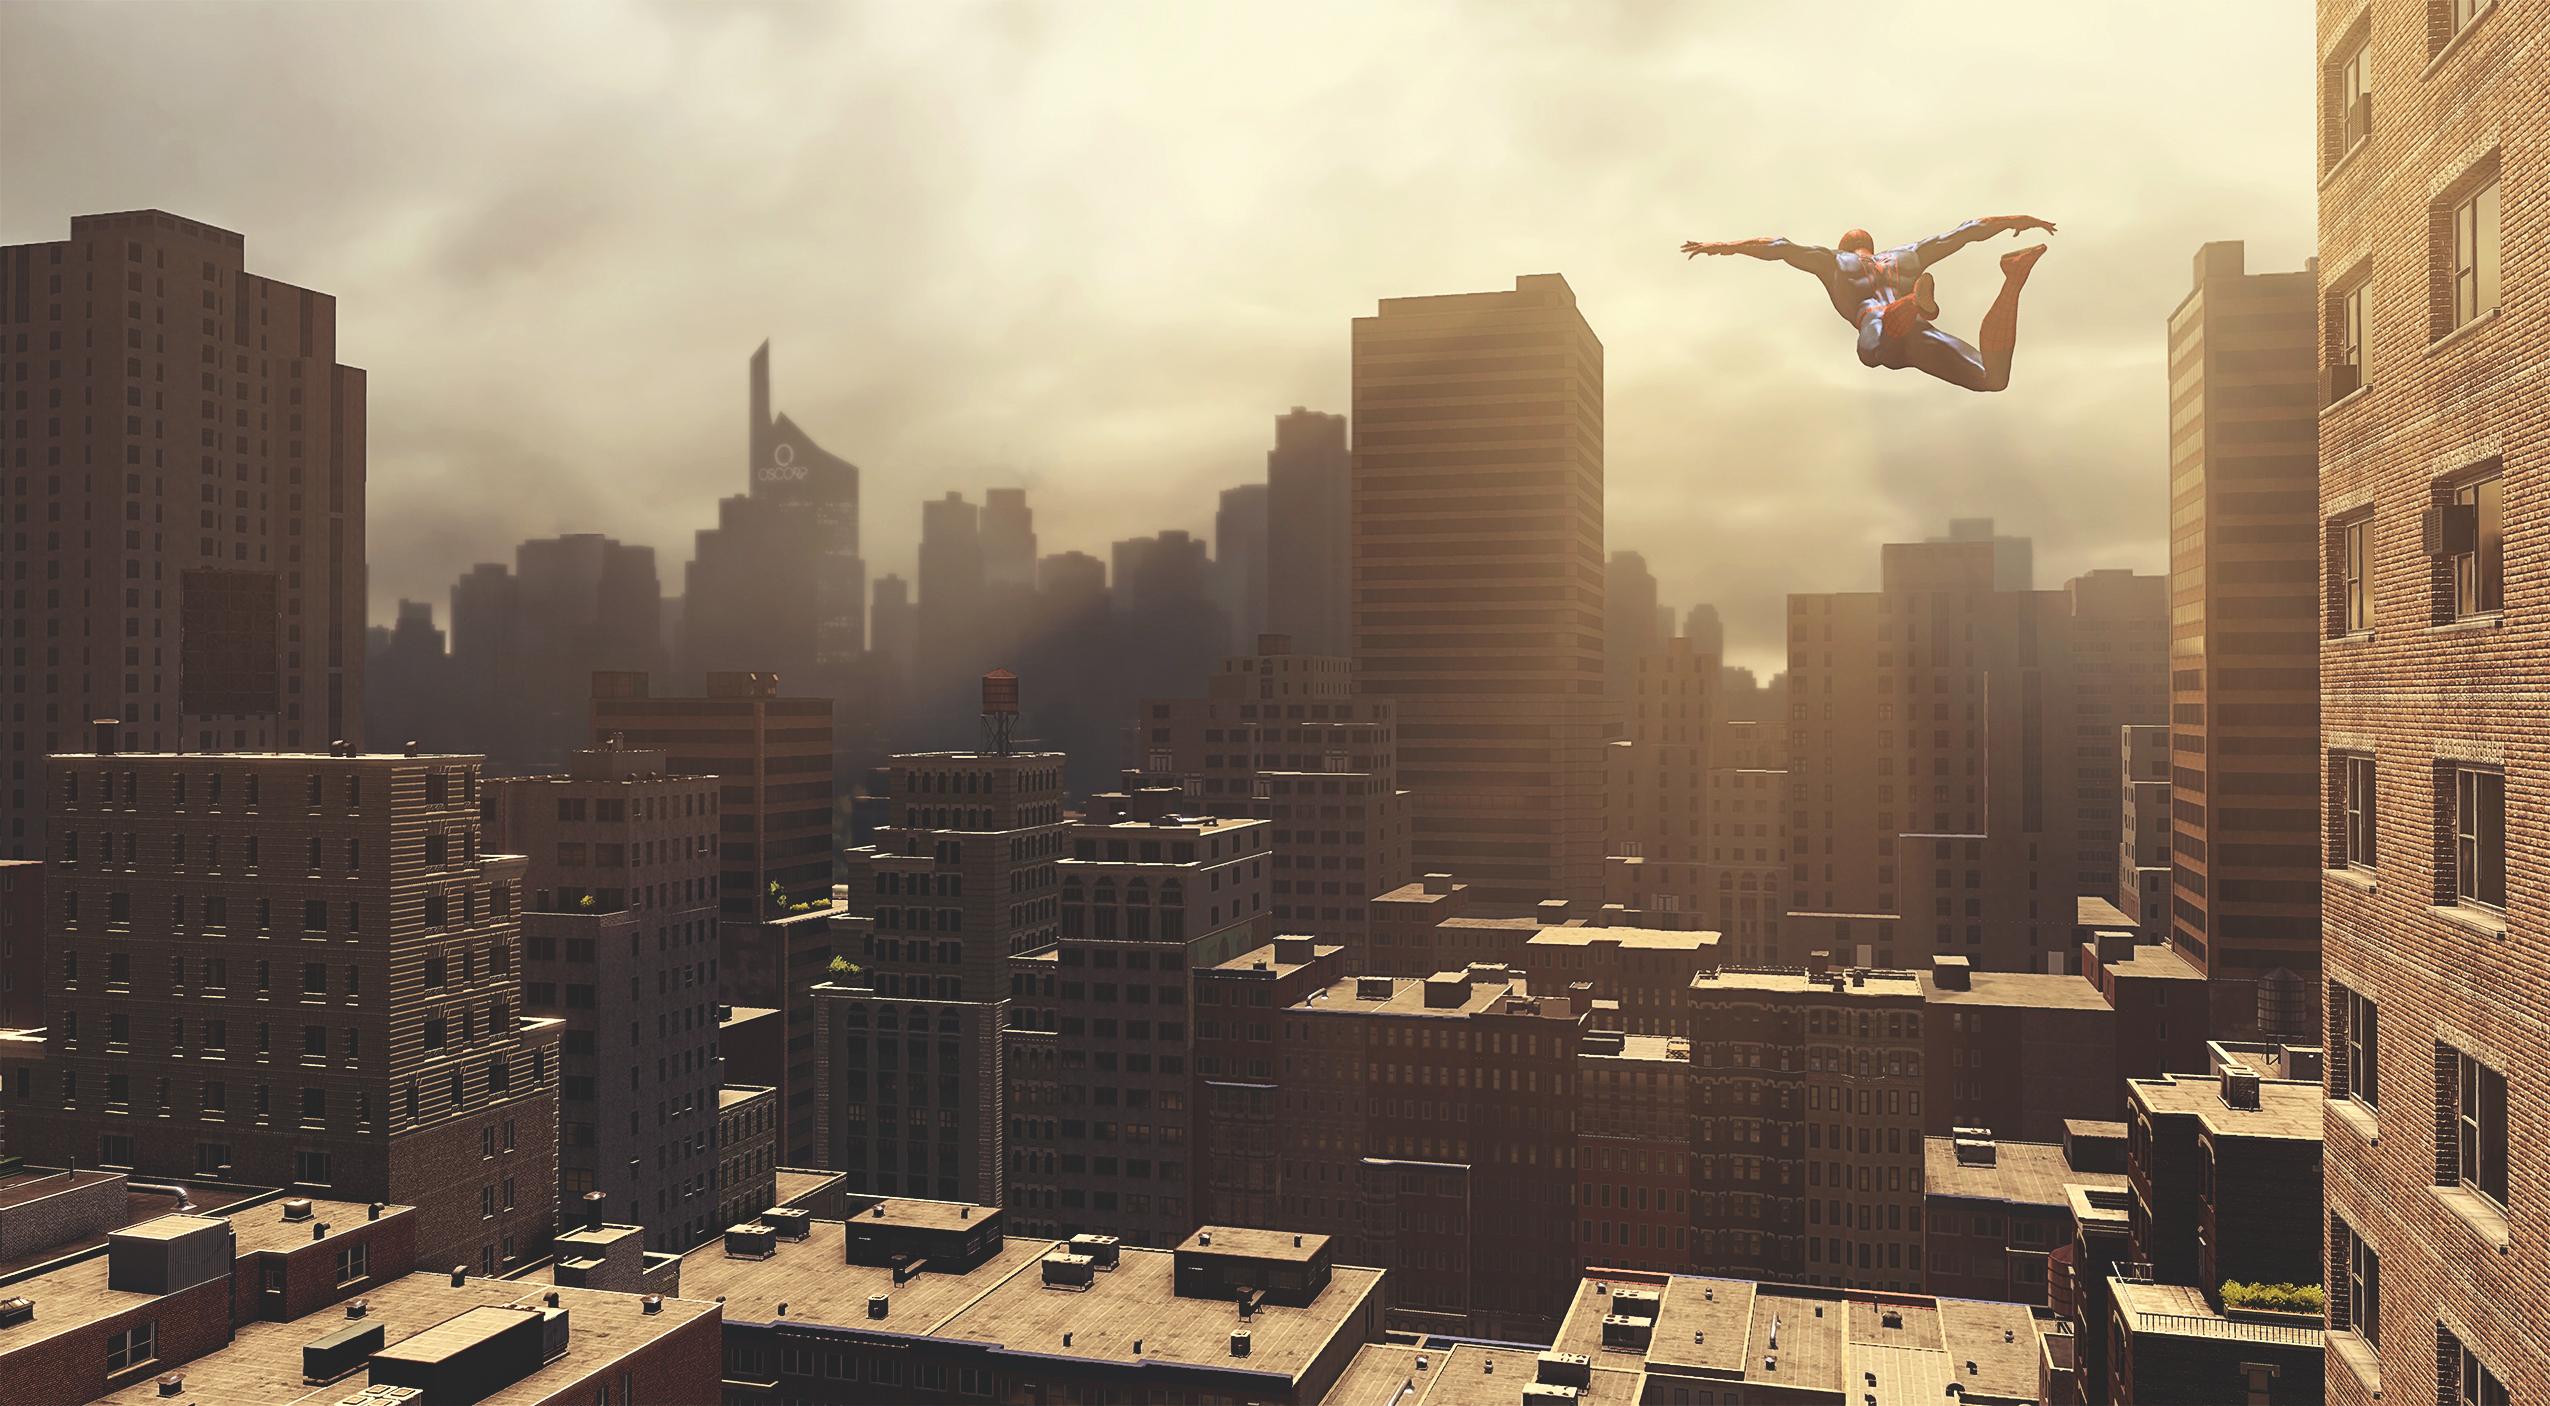 The Amazing Spider Man 2 Zero Punctuation Video Gallery The Escapist